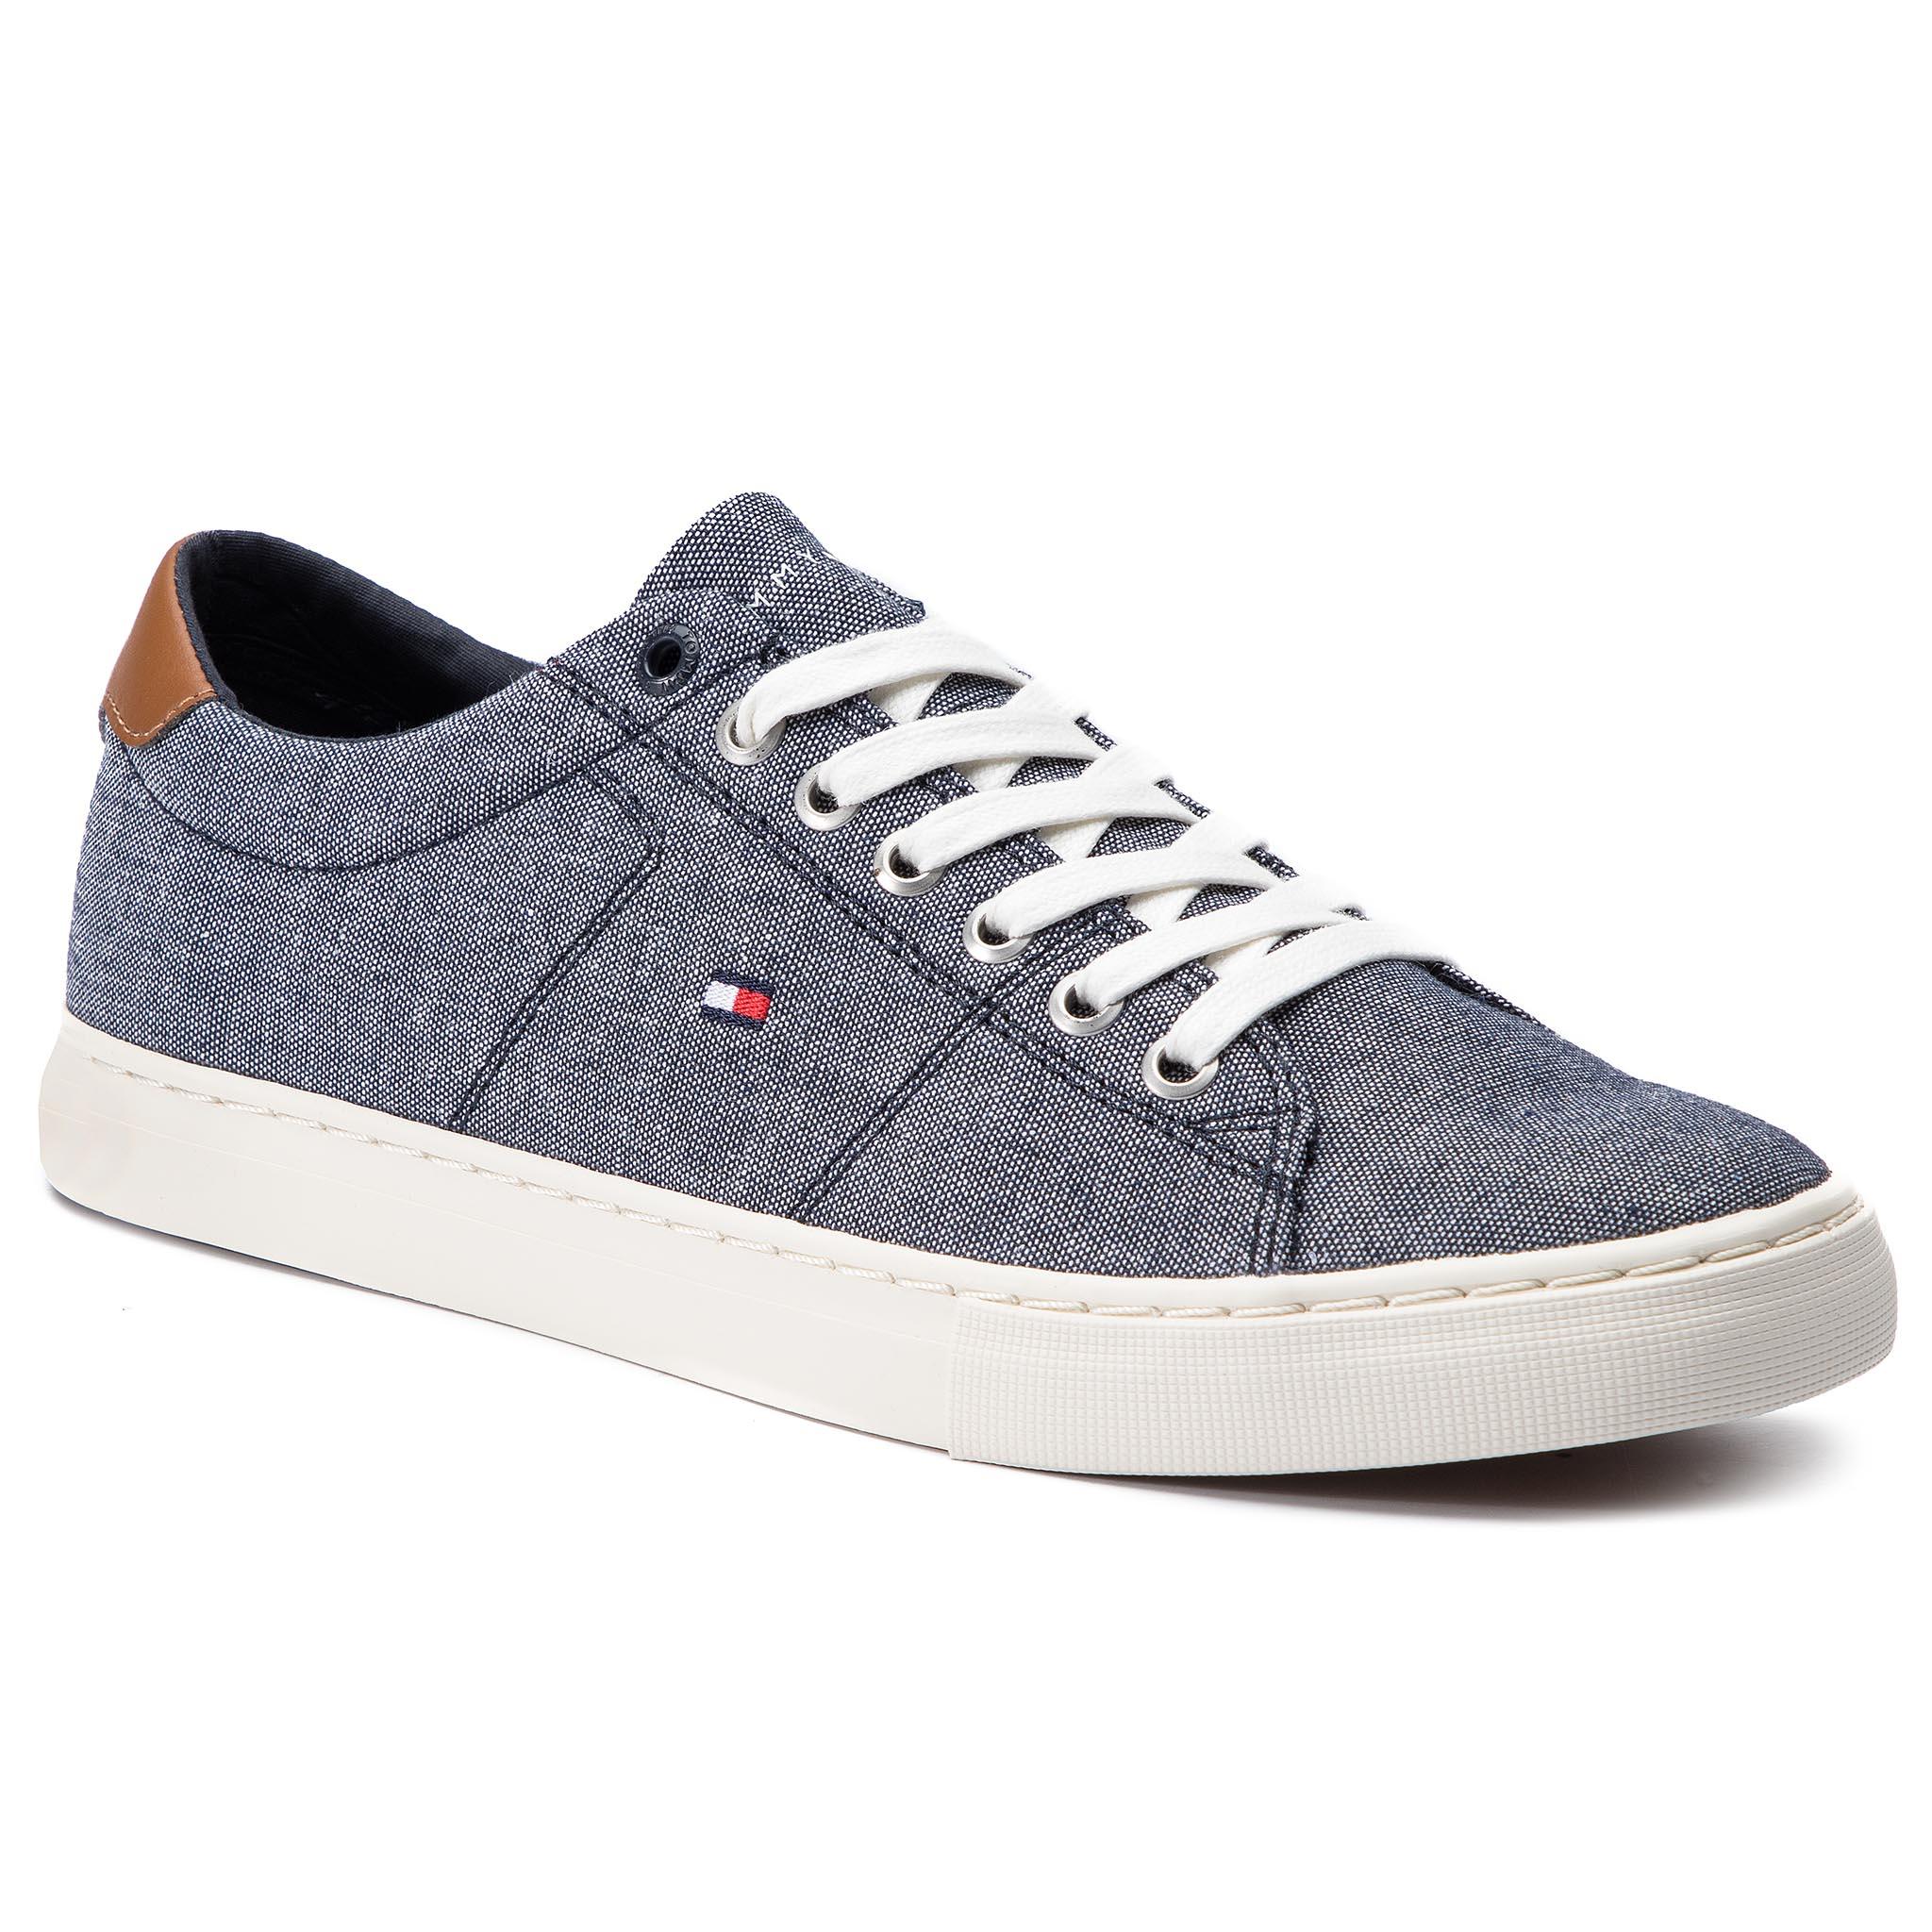 e68fd56ba2 Plimsolls TOMMY HILFIGER Seasonal Textile Sneaker FM0FM02204 Midnight 403